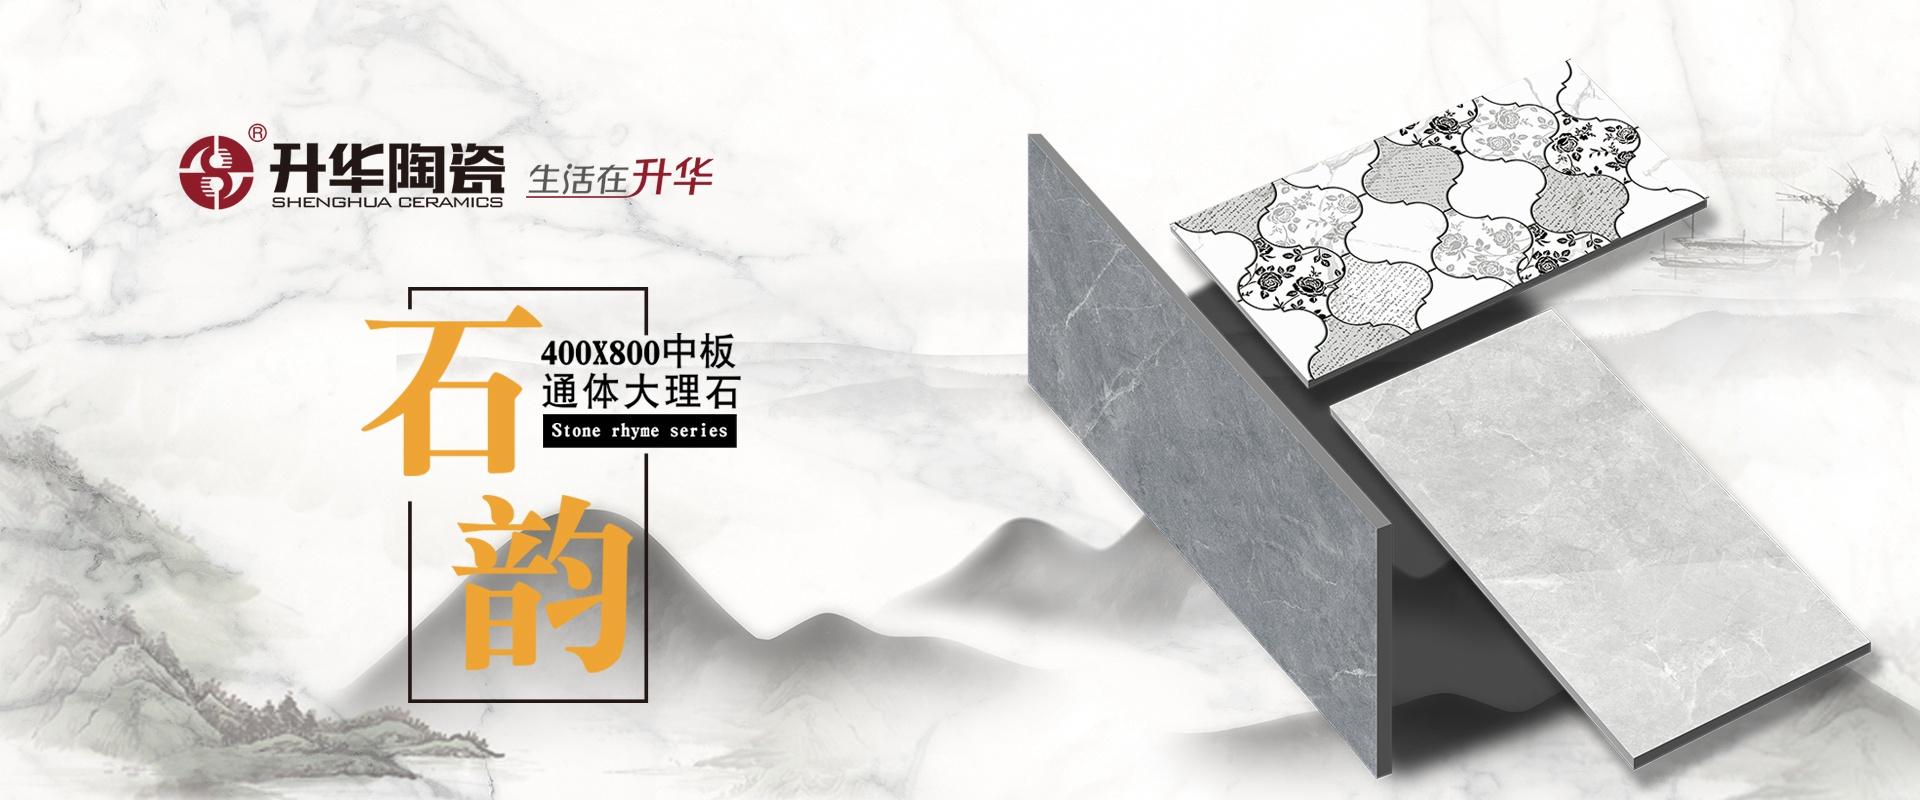 banner 新